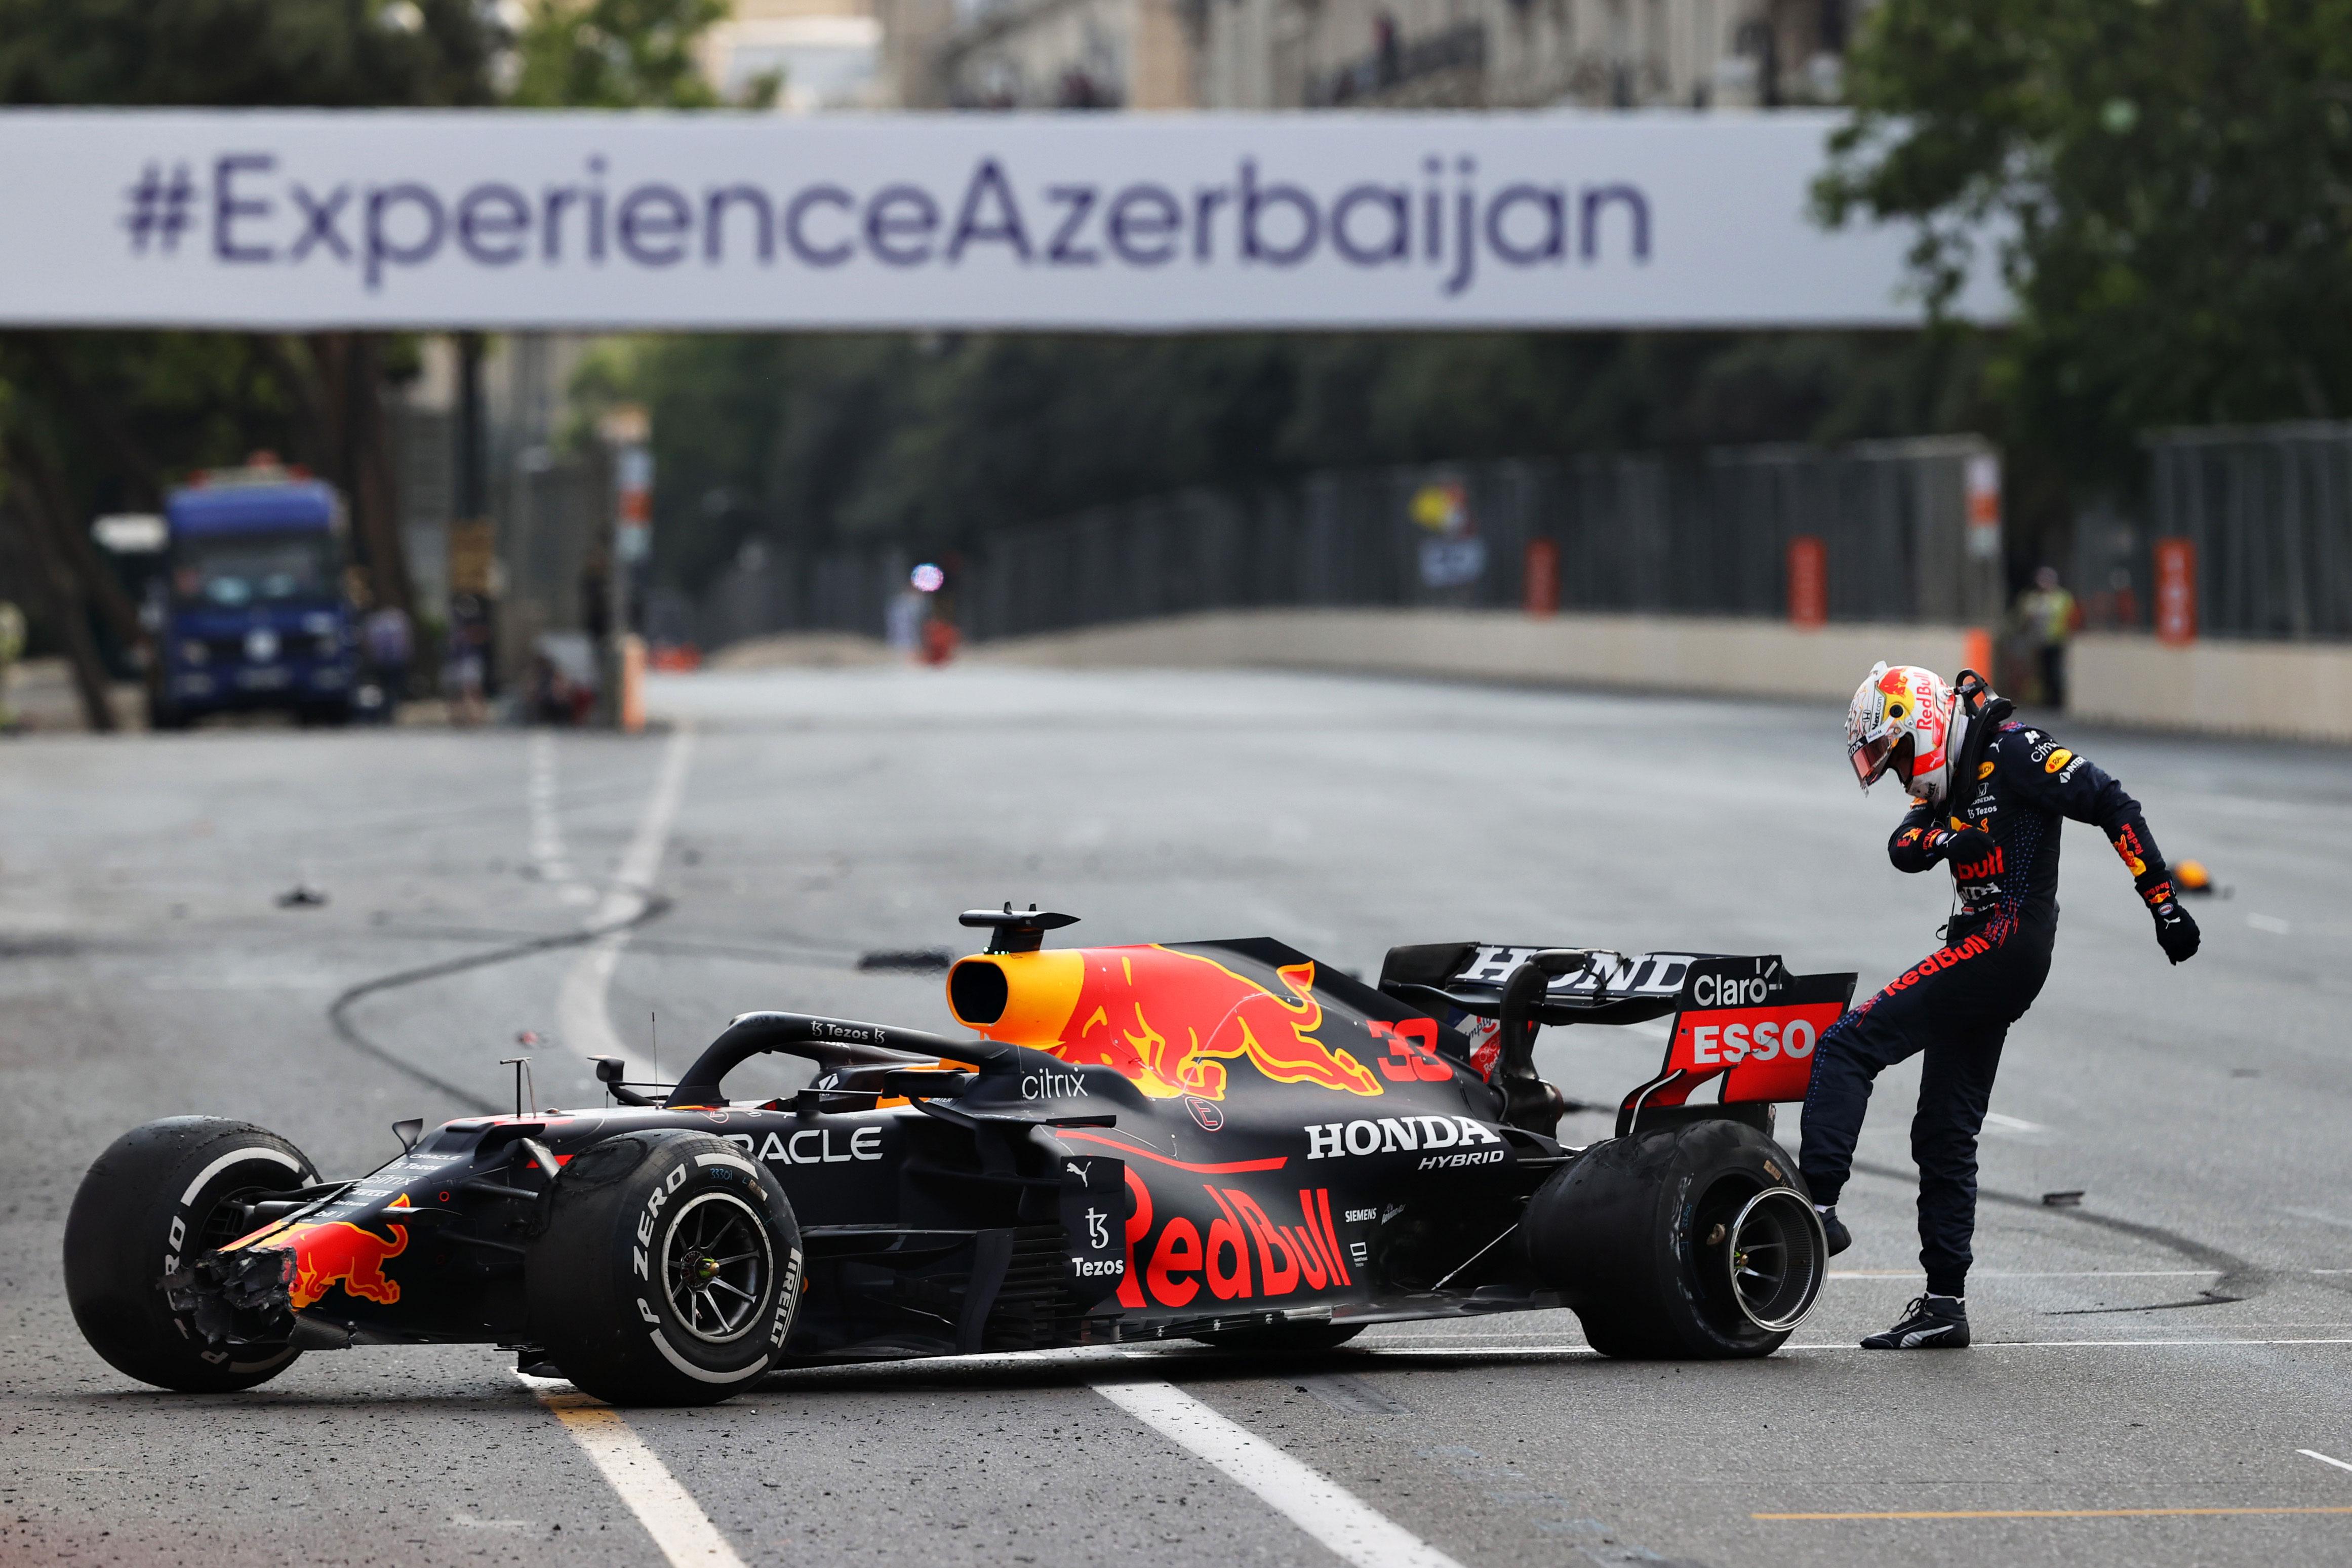 Azerbaijan Grand Prix: Max Verstappen suffers tire blow out as Sergio Perez claims win